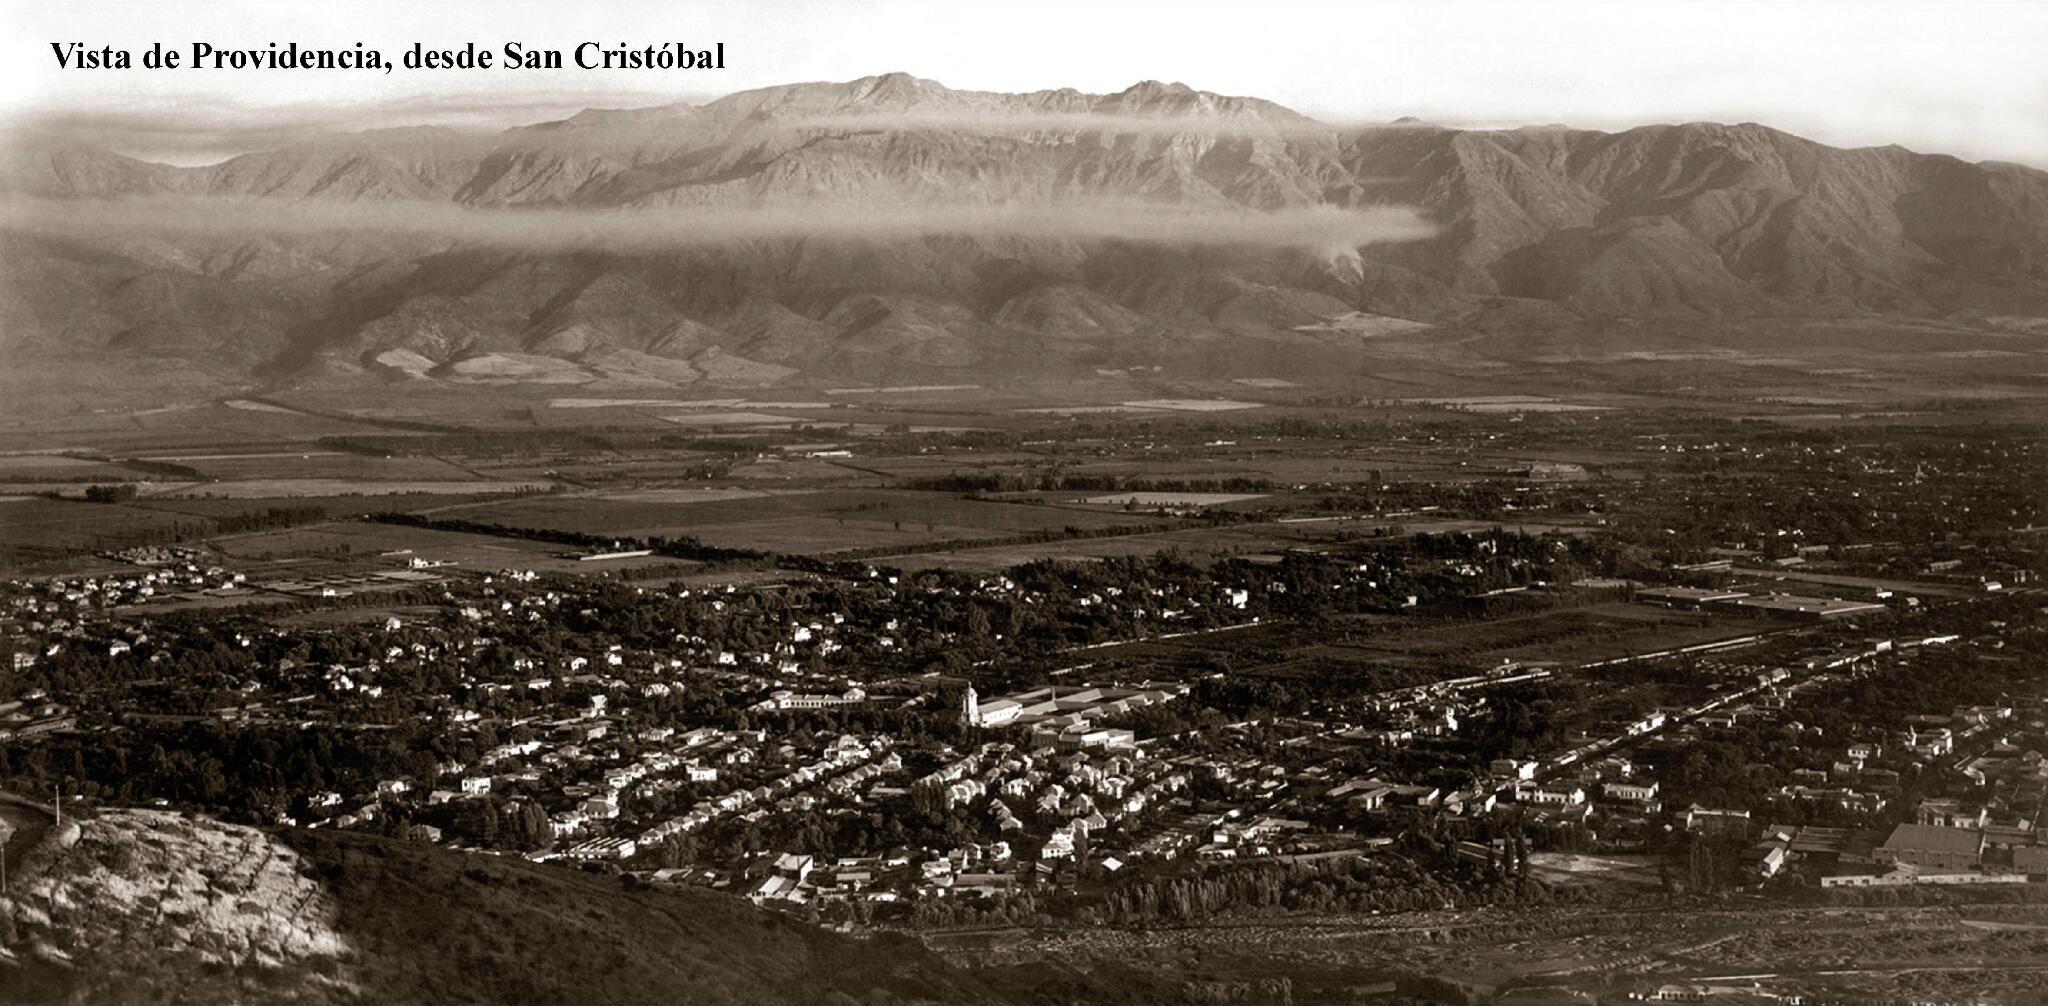 "RT @leo_rozas: ""@miplazav: #Santiago Vista de Providencia desde el C° San Cristóbal en 1900 http://t.co/hB0o7dkDap"" increible foto!"